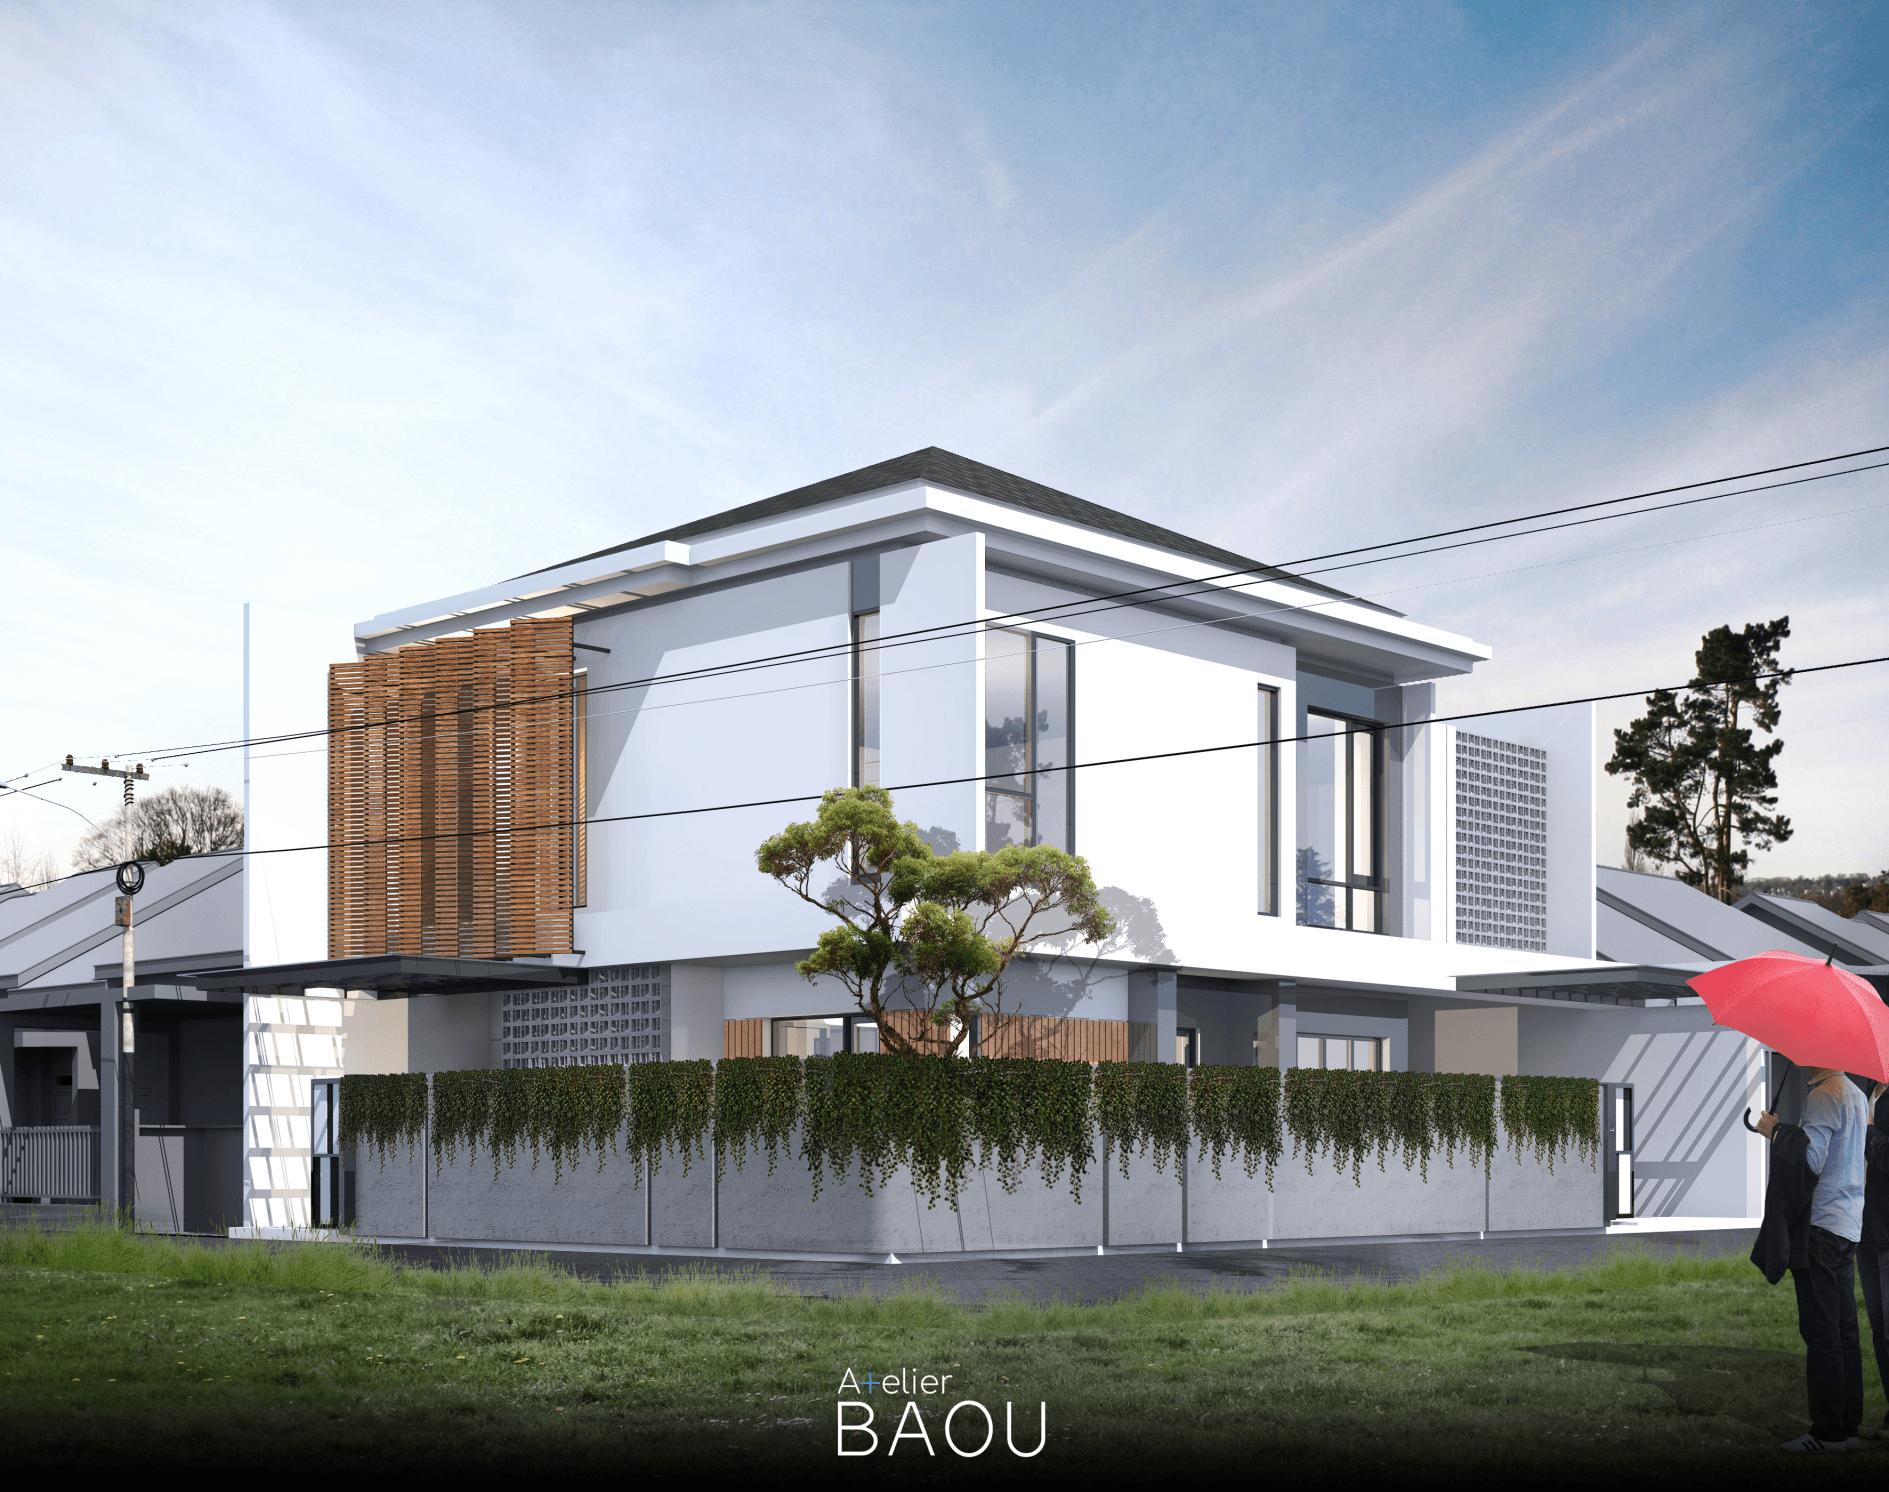 Atelier Baou Vc House Kec. Ciputat, Kota Tangerang Selatan, Banten, Indonesia Kec. Ciputat, Kota Tangerang Selatan, Banten, Indonesia Atelier-Baou-Vc-House  86485